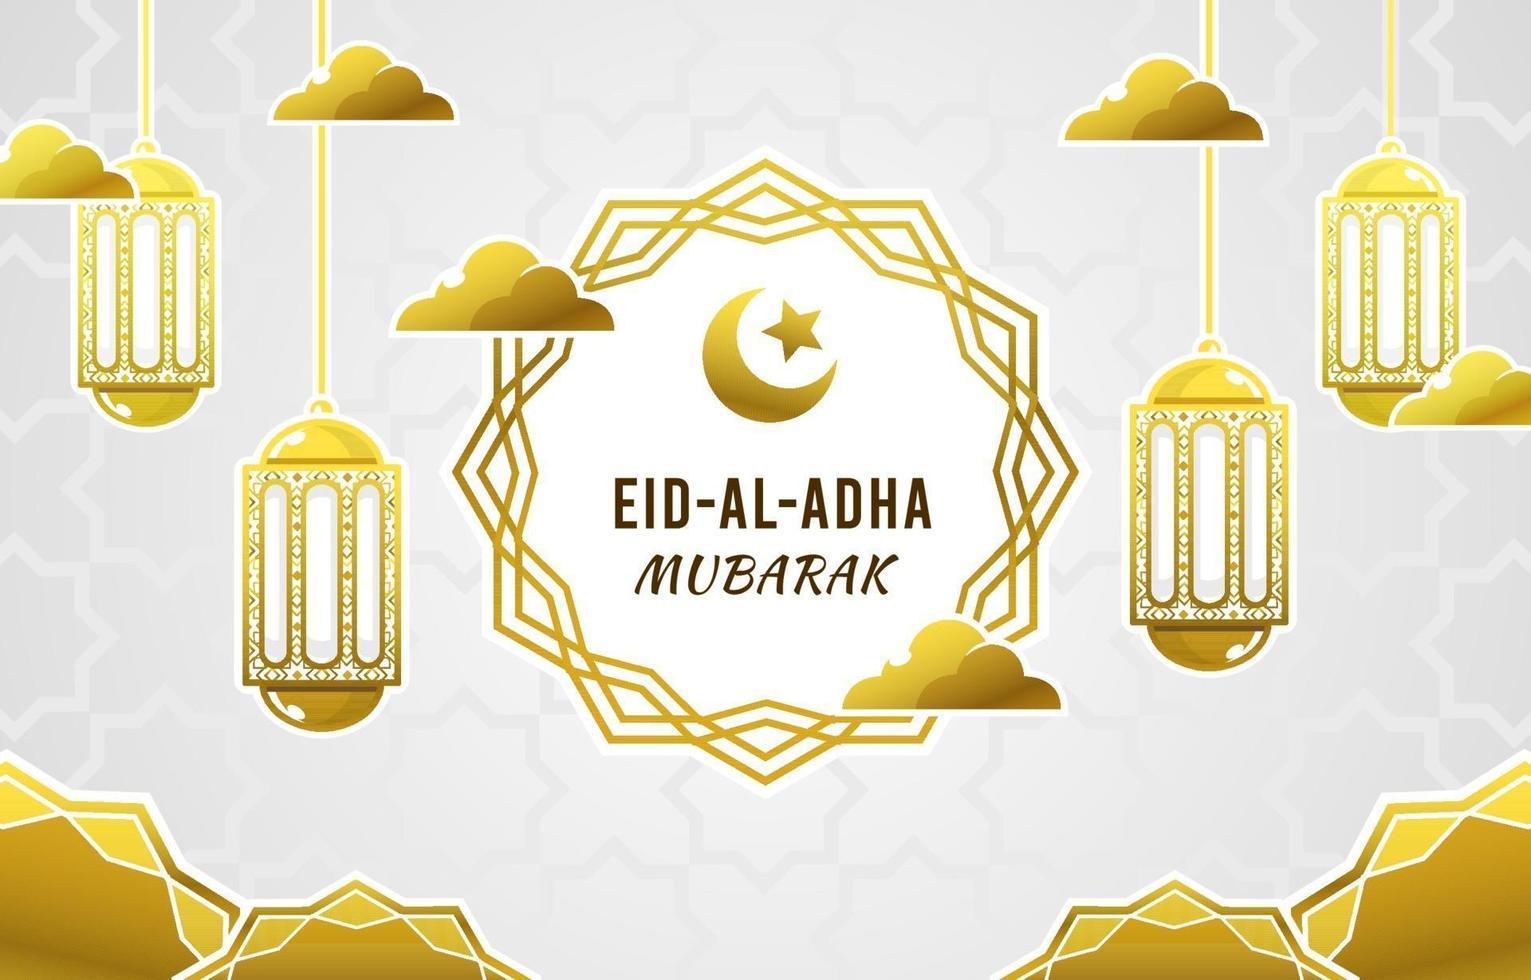 eid al adha mubarak Hintergrund vektor